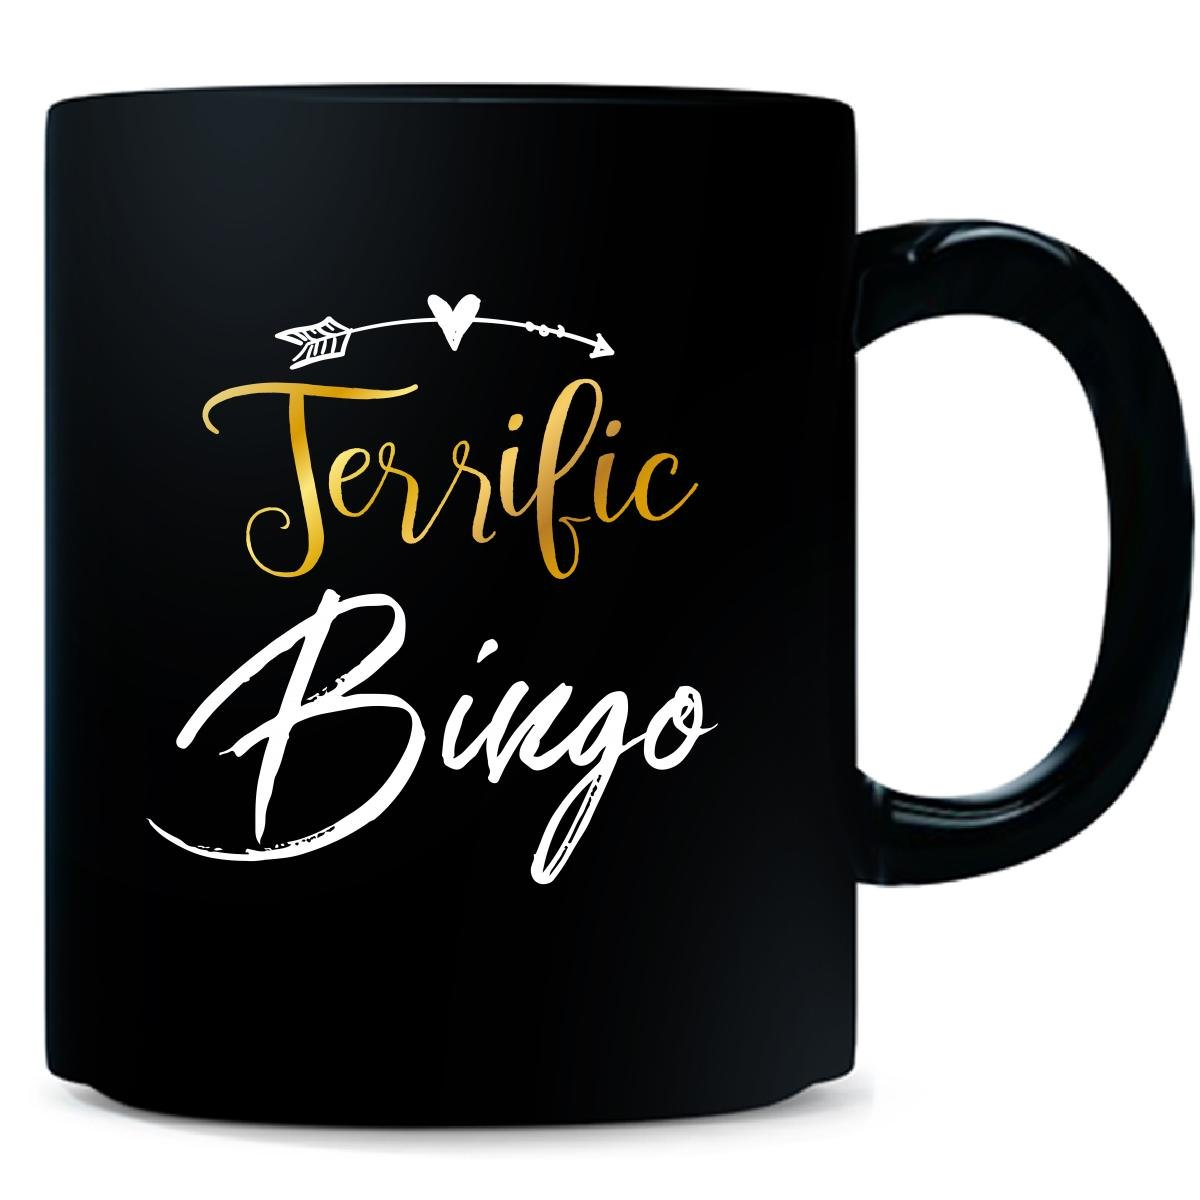 Terrific Bingo Name Mothers Day Present Grandma - Mug